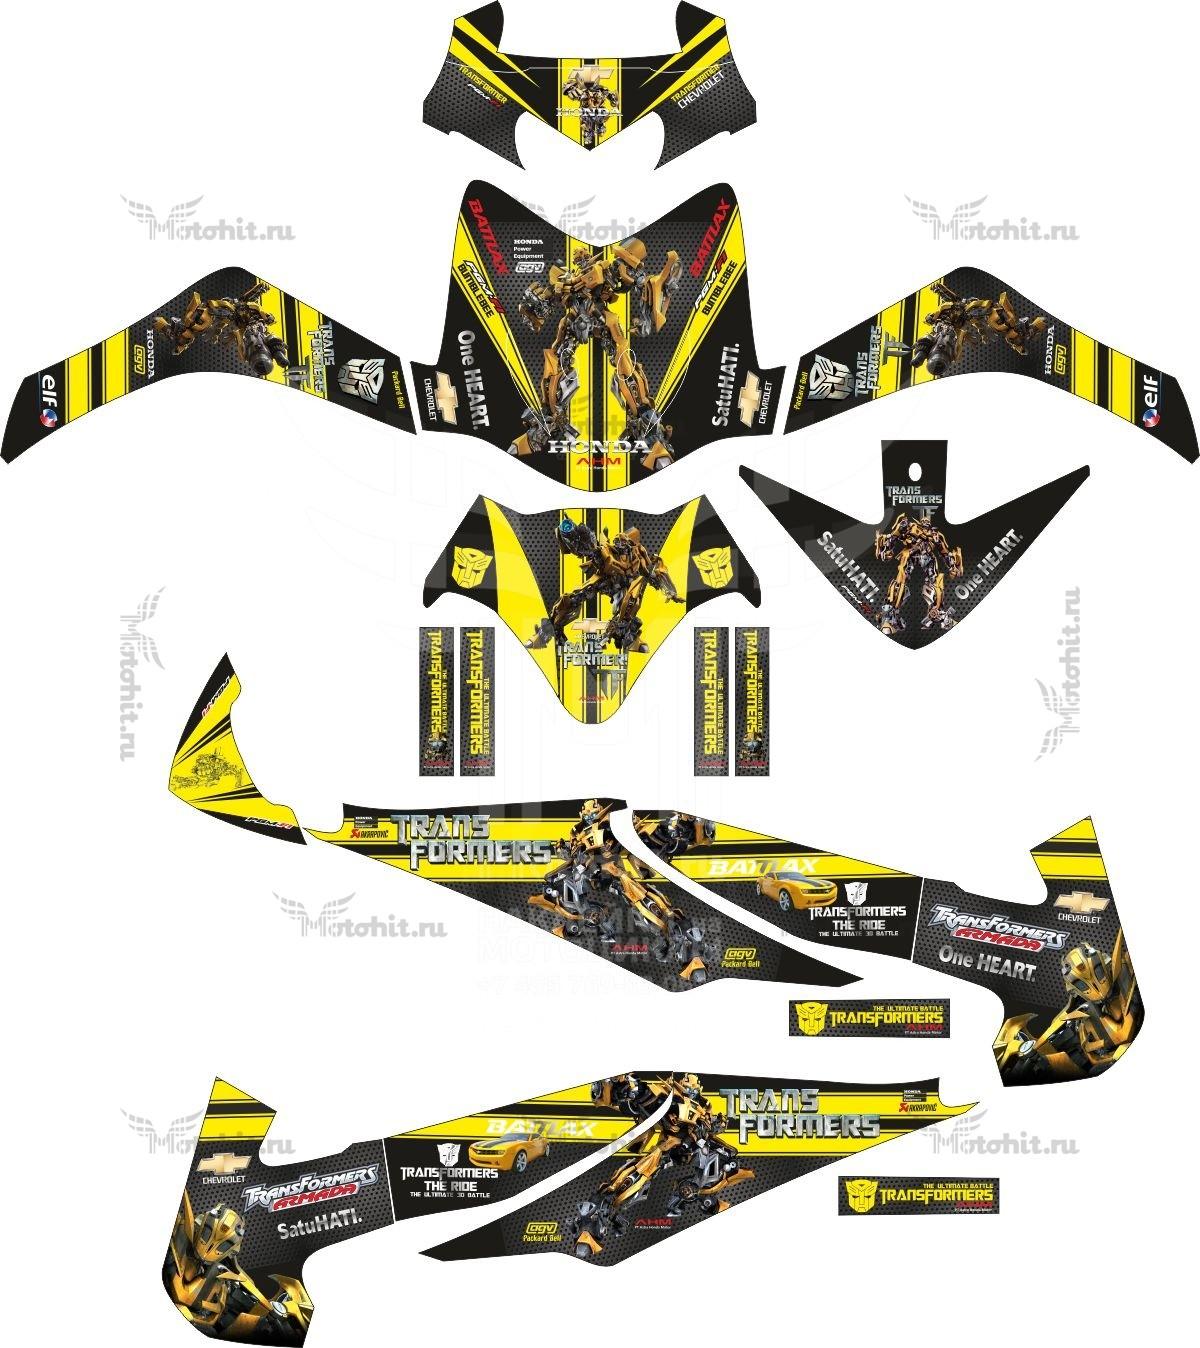 Комплект наклеек на скутер HONDA REVO TRANSFORMER BUMBLEBEE